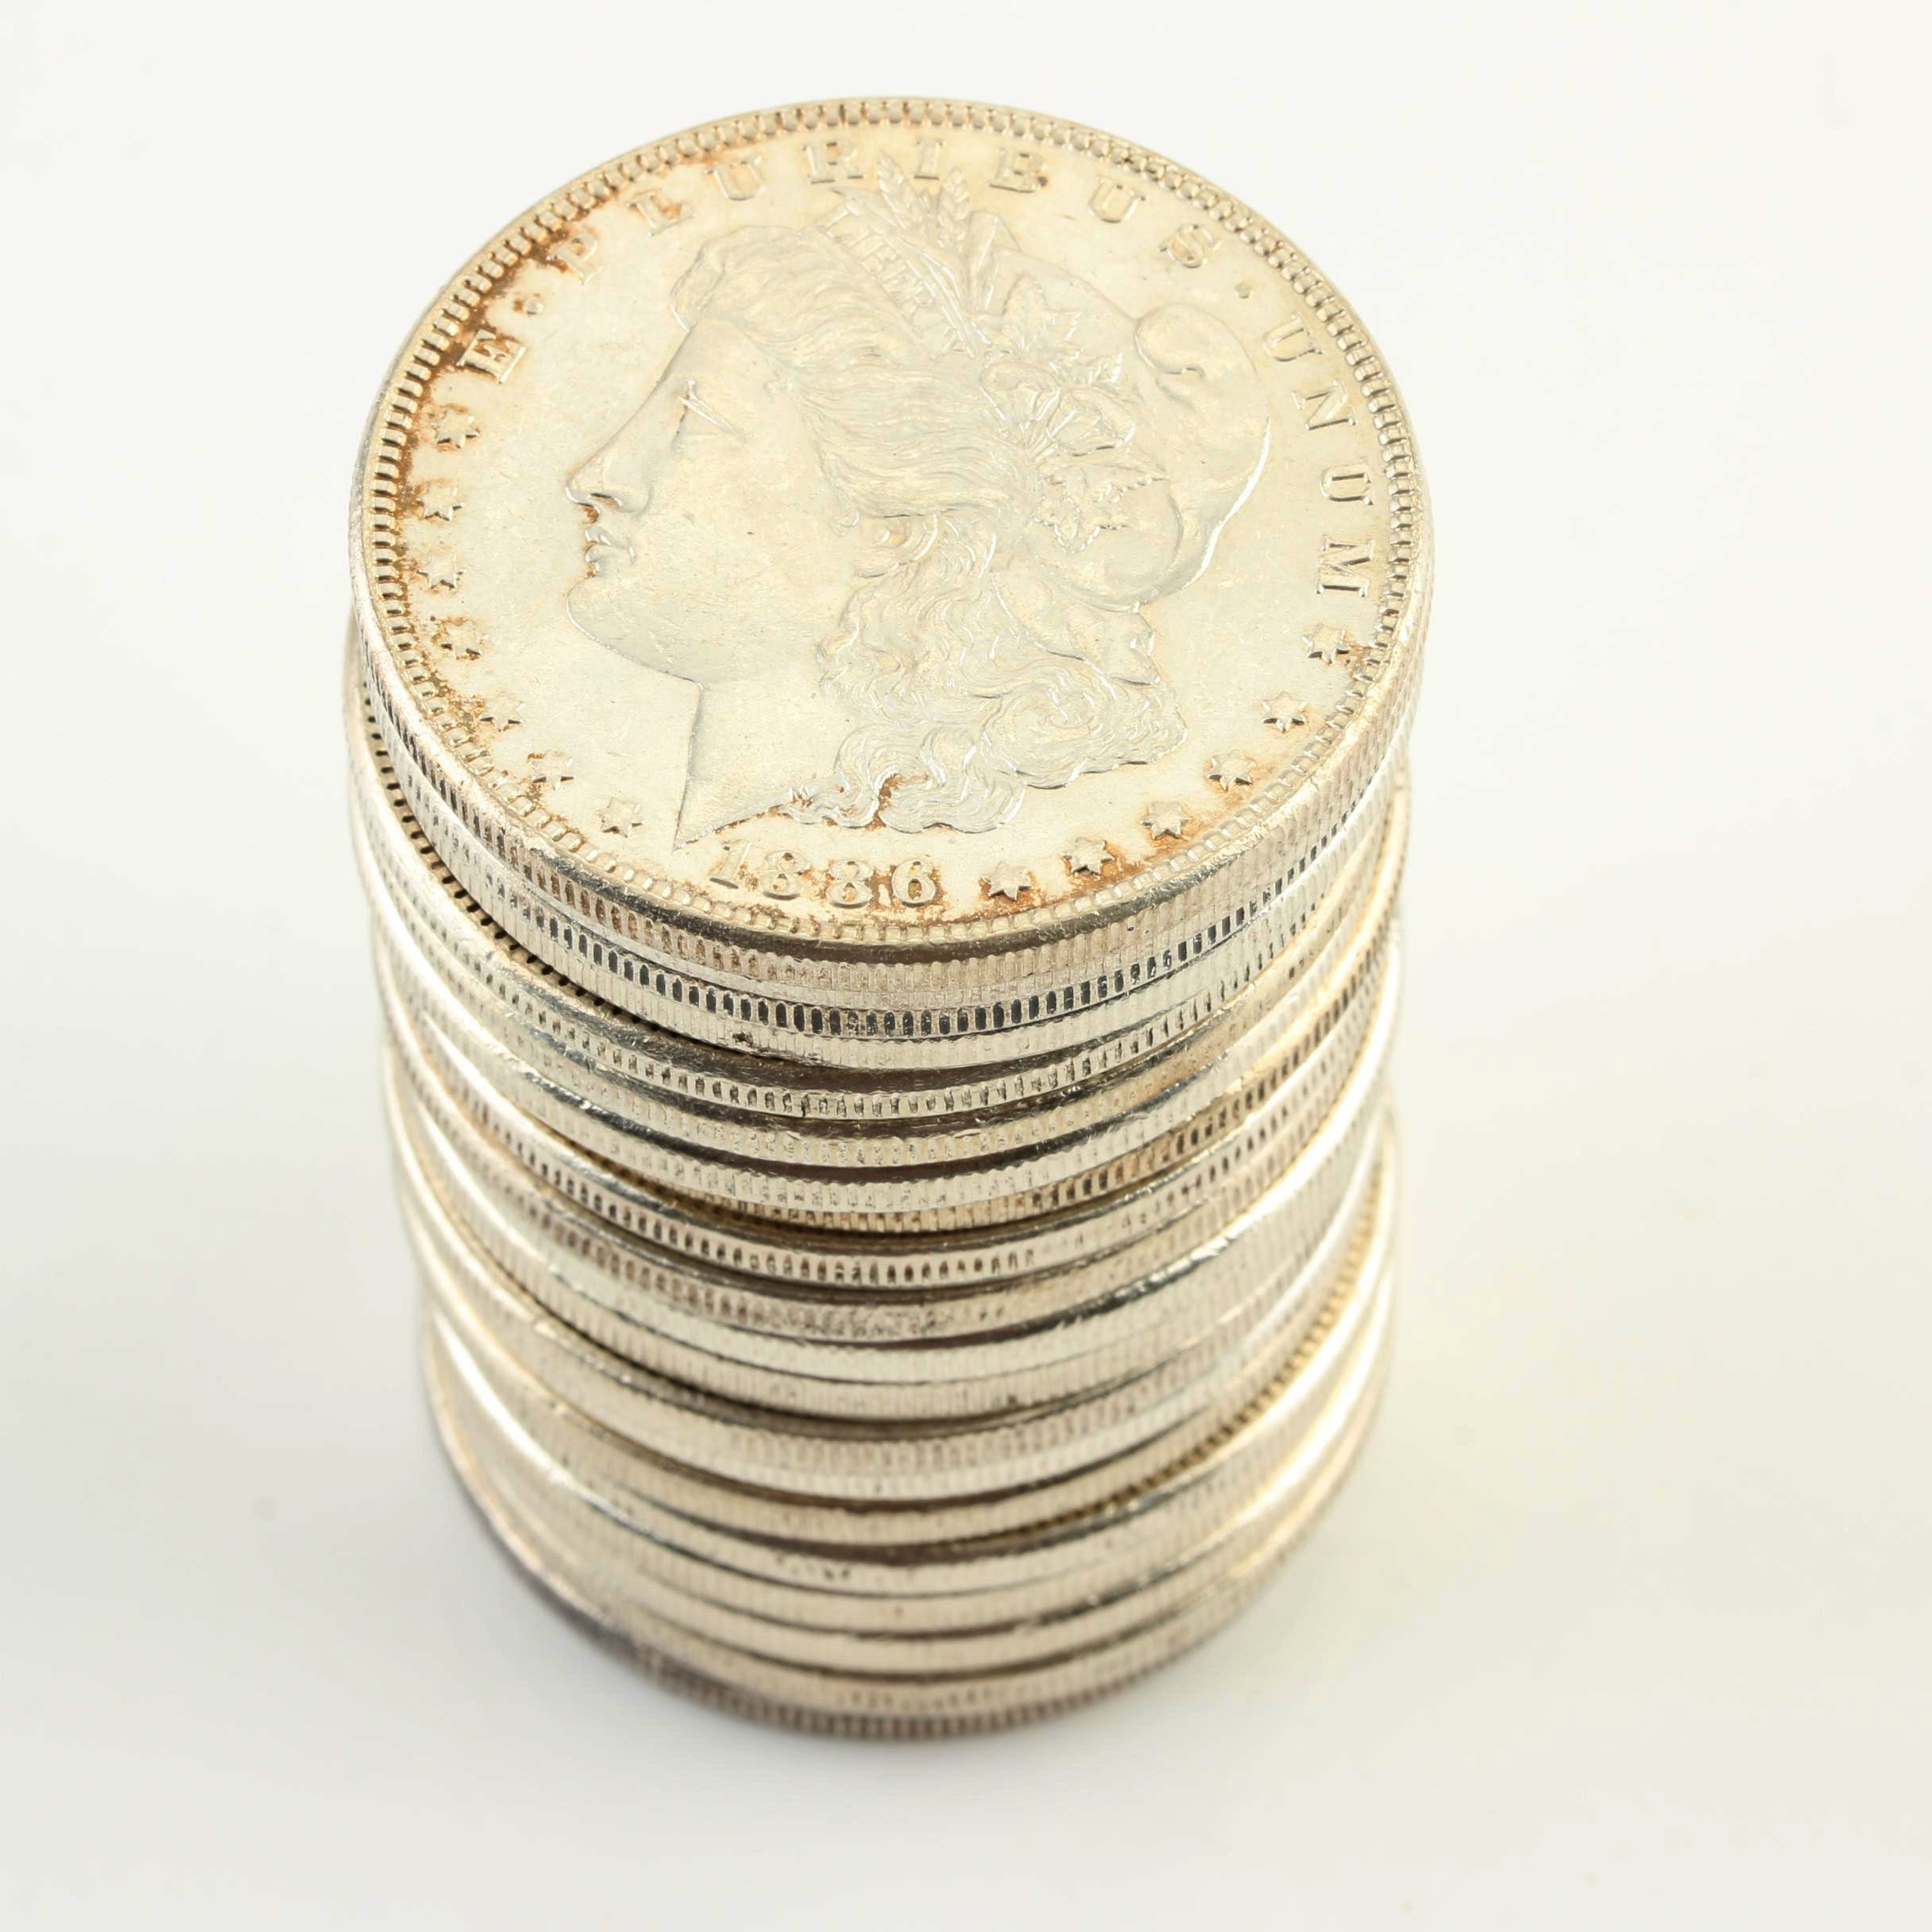 Group of Twenty Uncirculated 1886 Silver Morgan Dollars